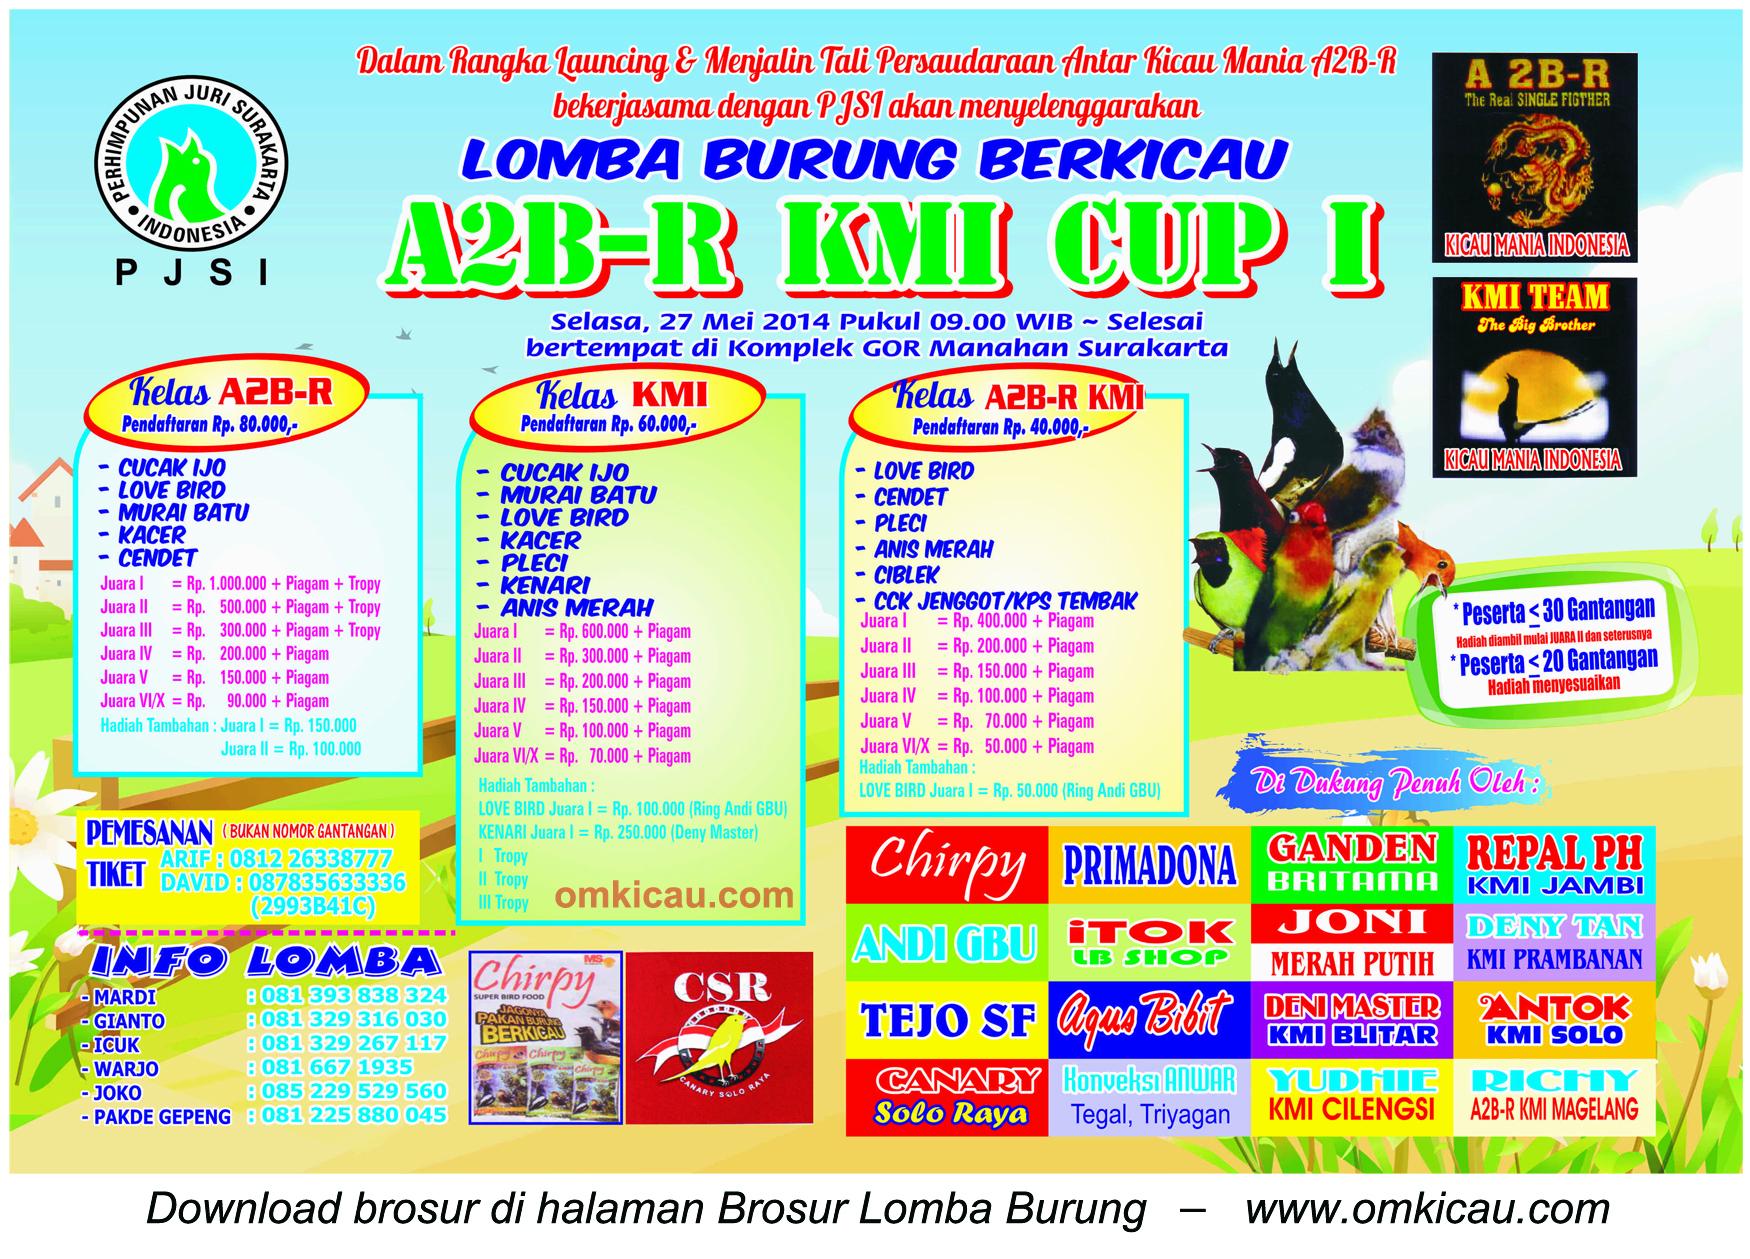 Brosur Lomba Burung Berkicau A2B-R KMI Cup 1, Solo, 27 Mei 2014